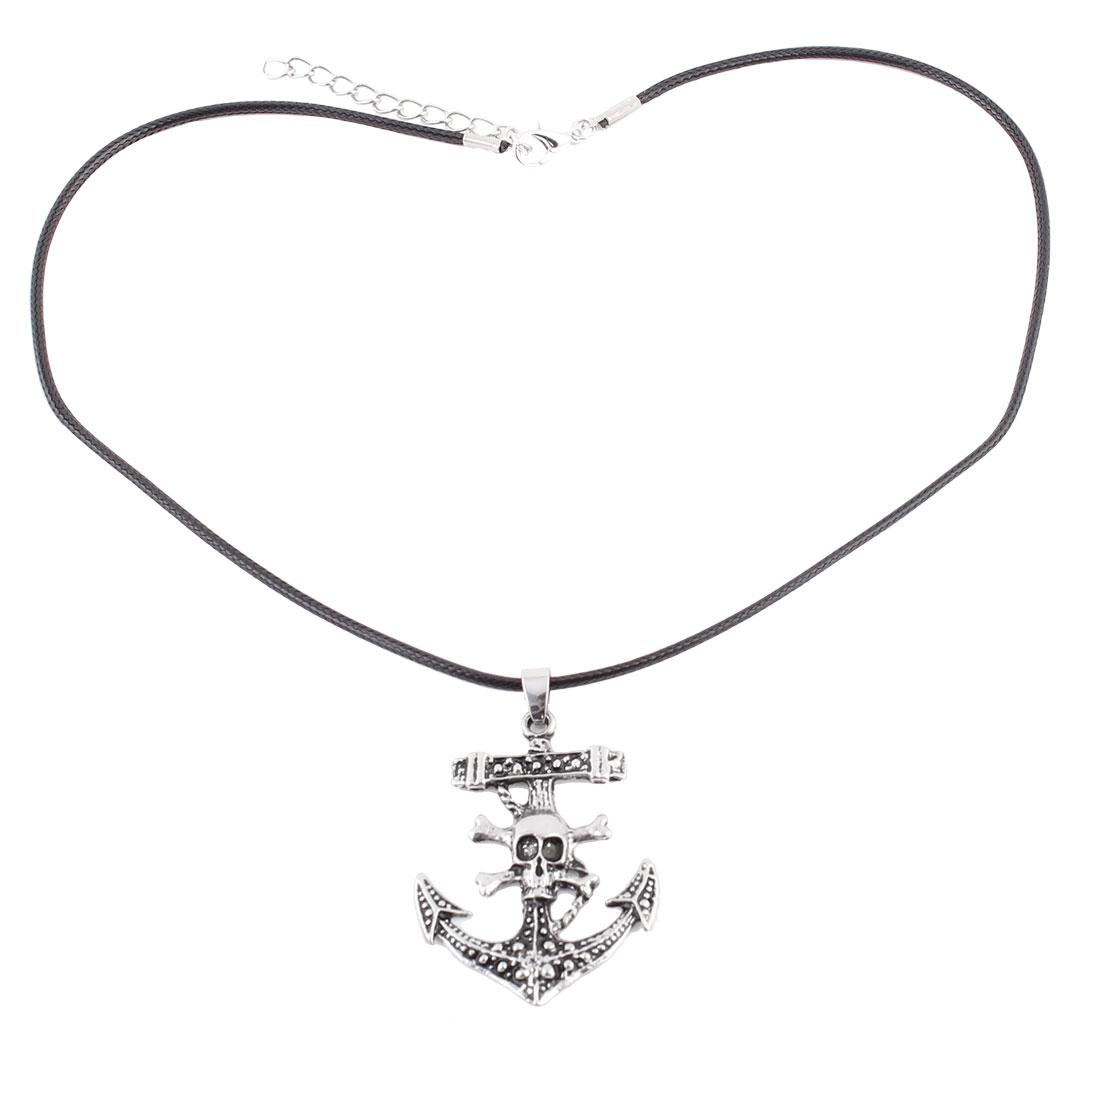 Unisex Metal Pendant Braided Nylon String Skull Shaped Necklace Neck Decoration Black Silver Tone